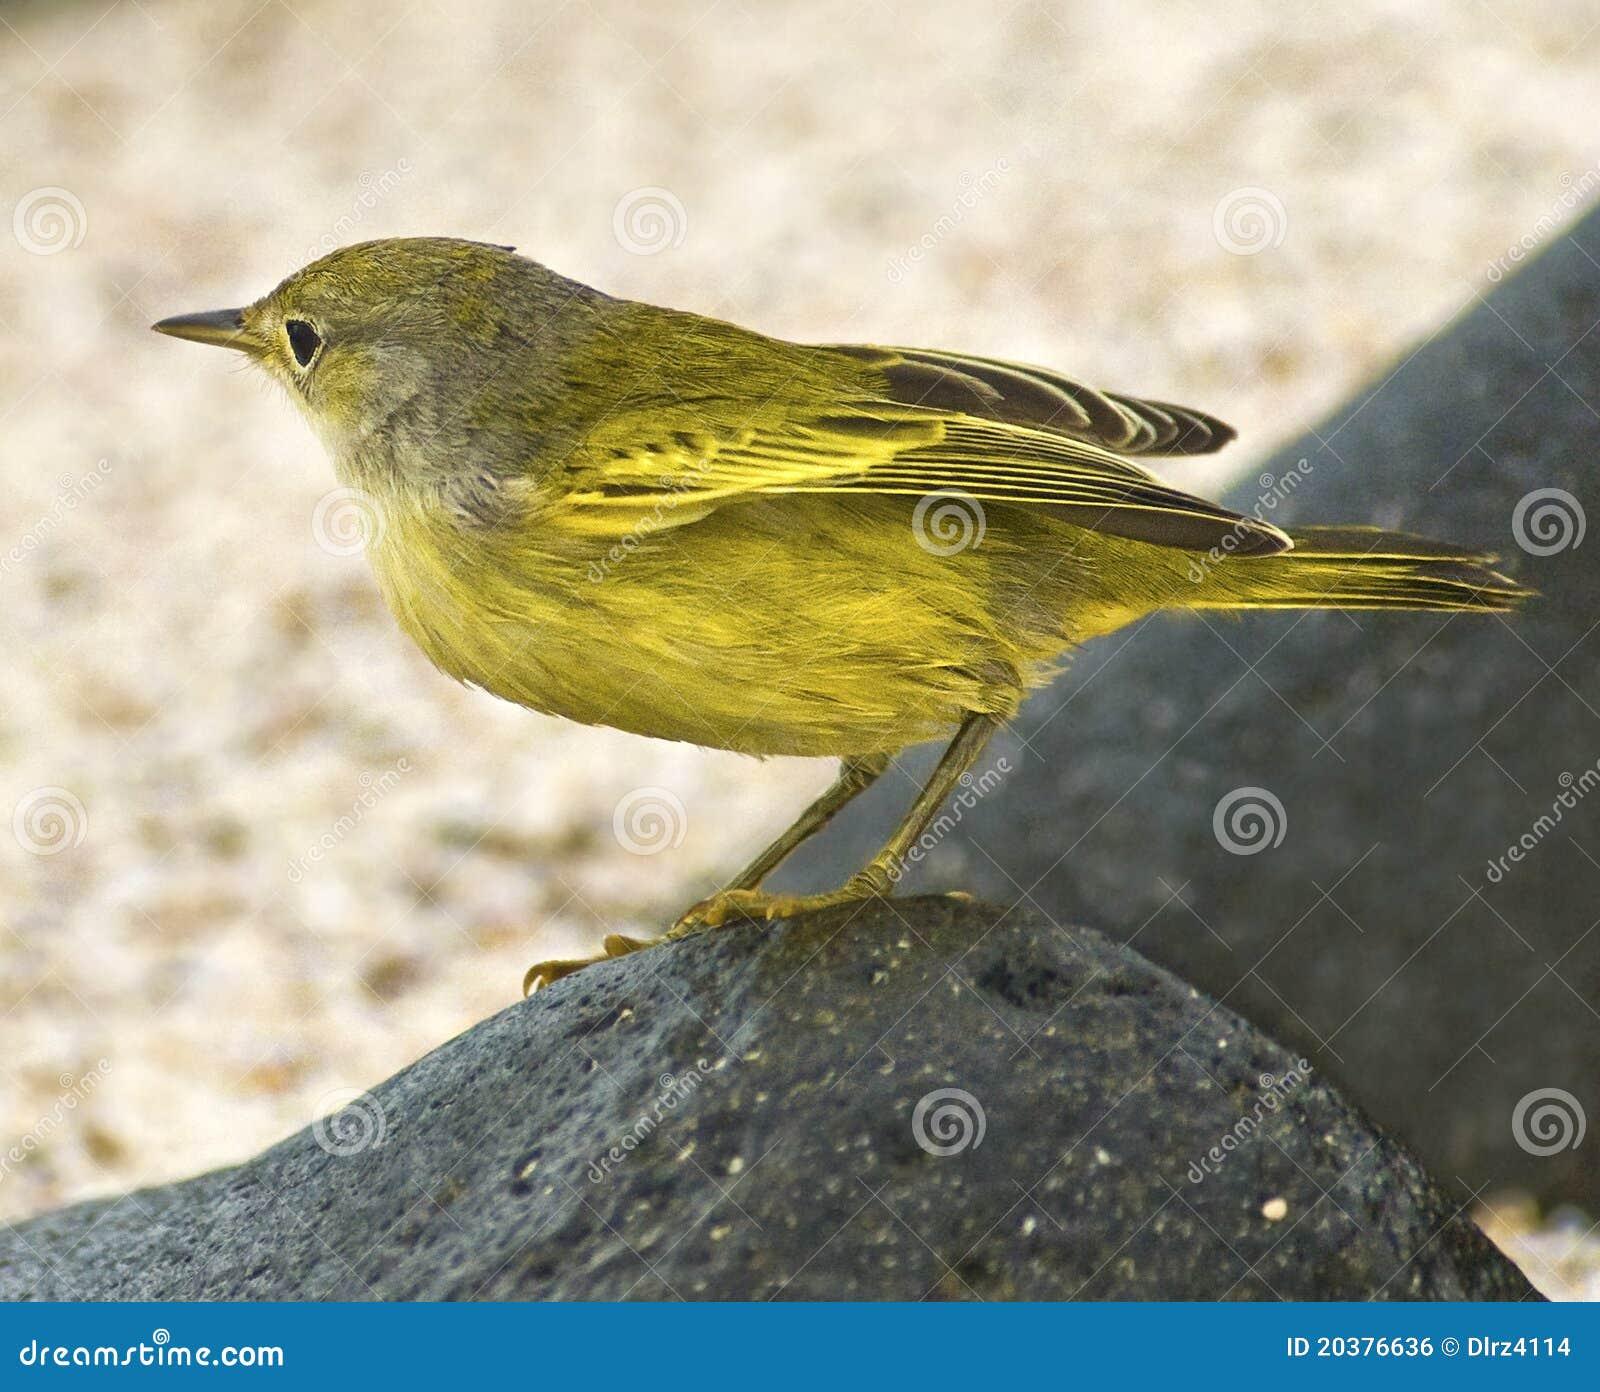 Galapagos Canary